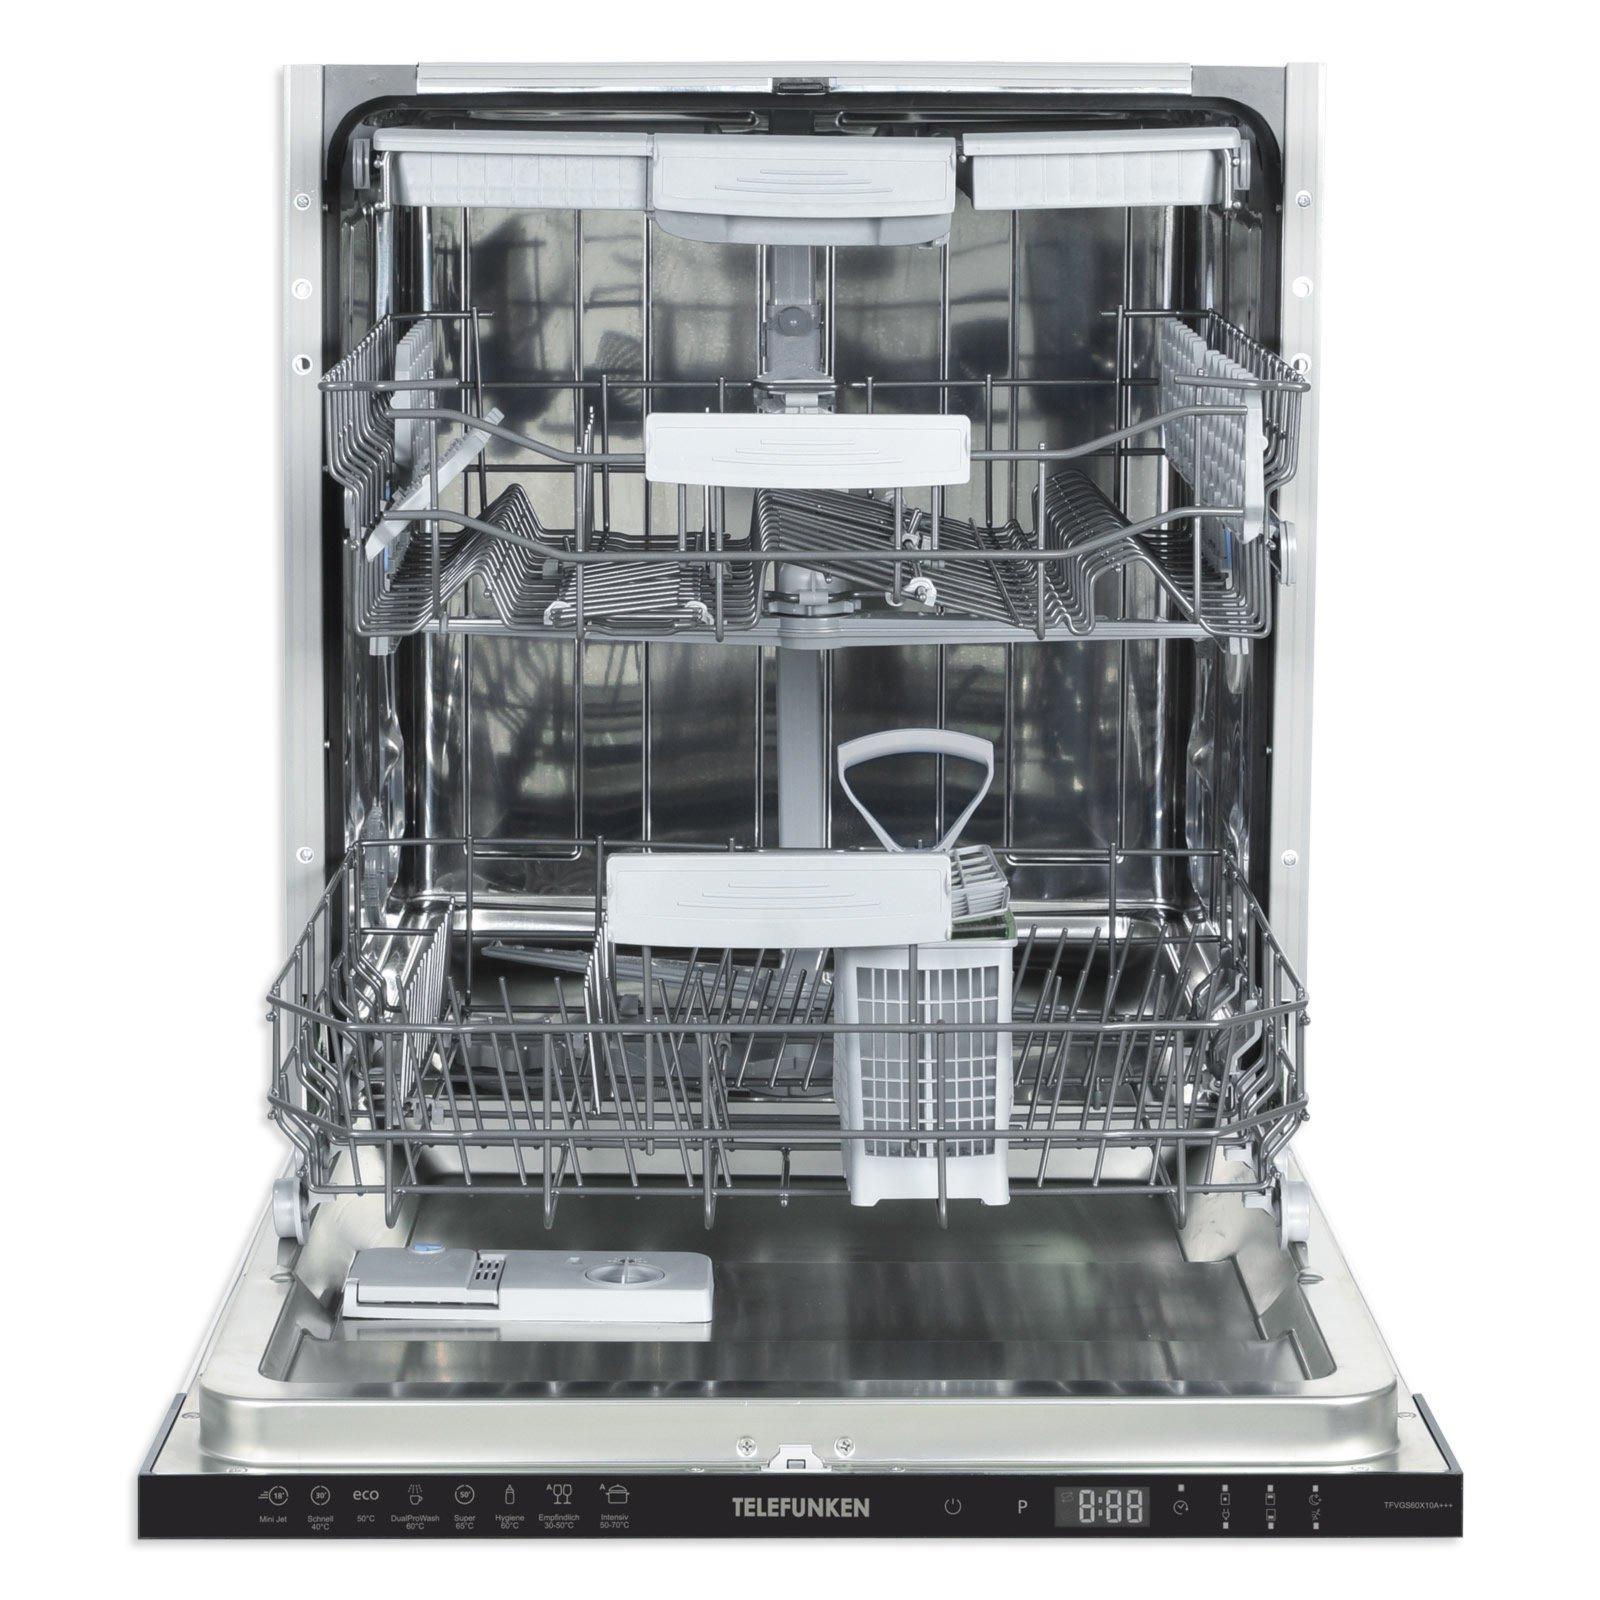 Geschirrspüler Elektrogroßgeräte Deko & Haushalt